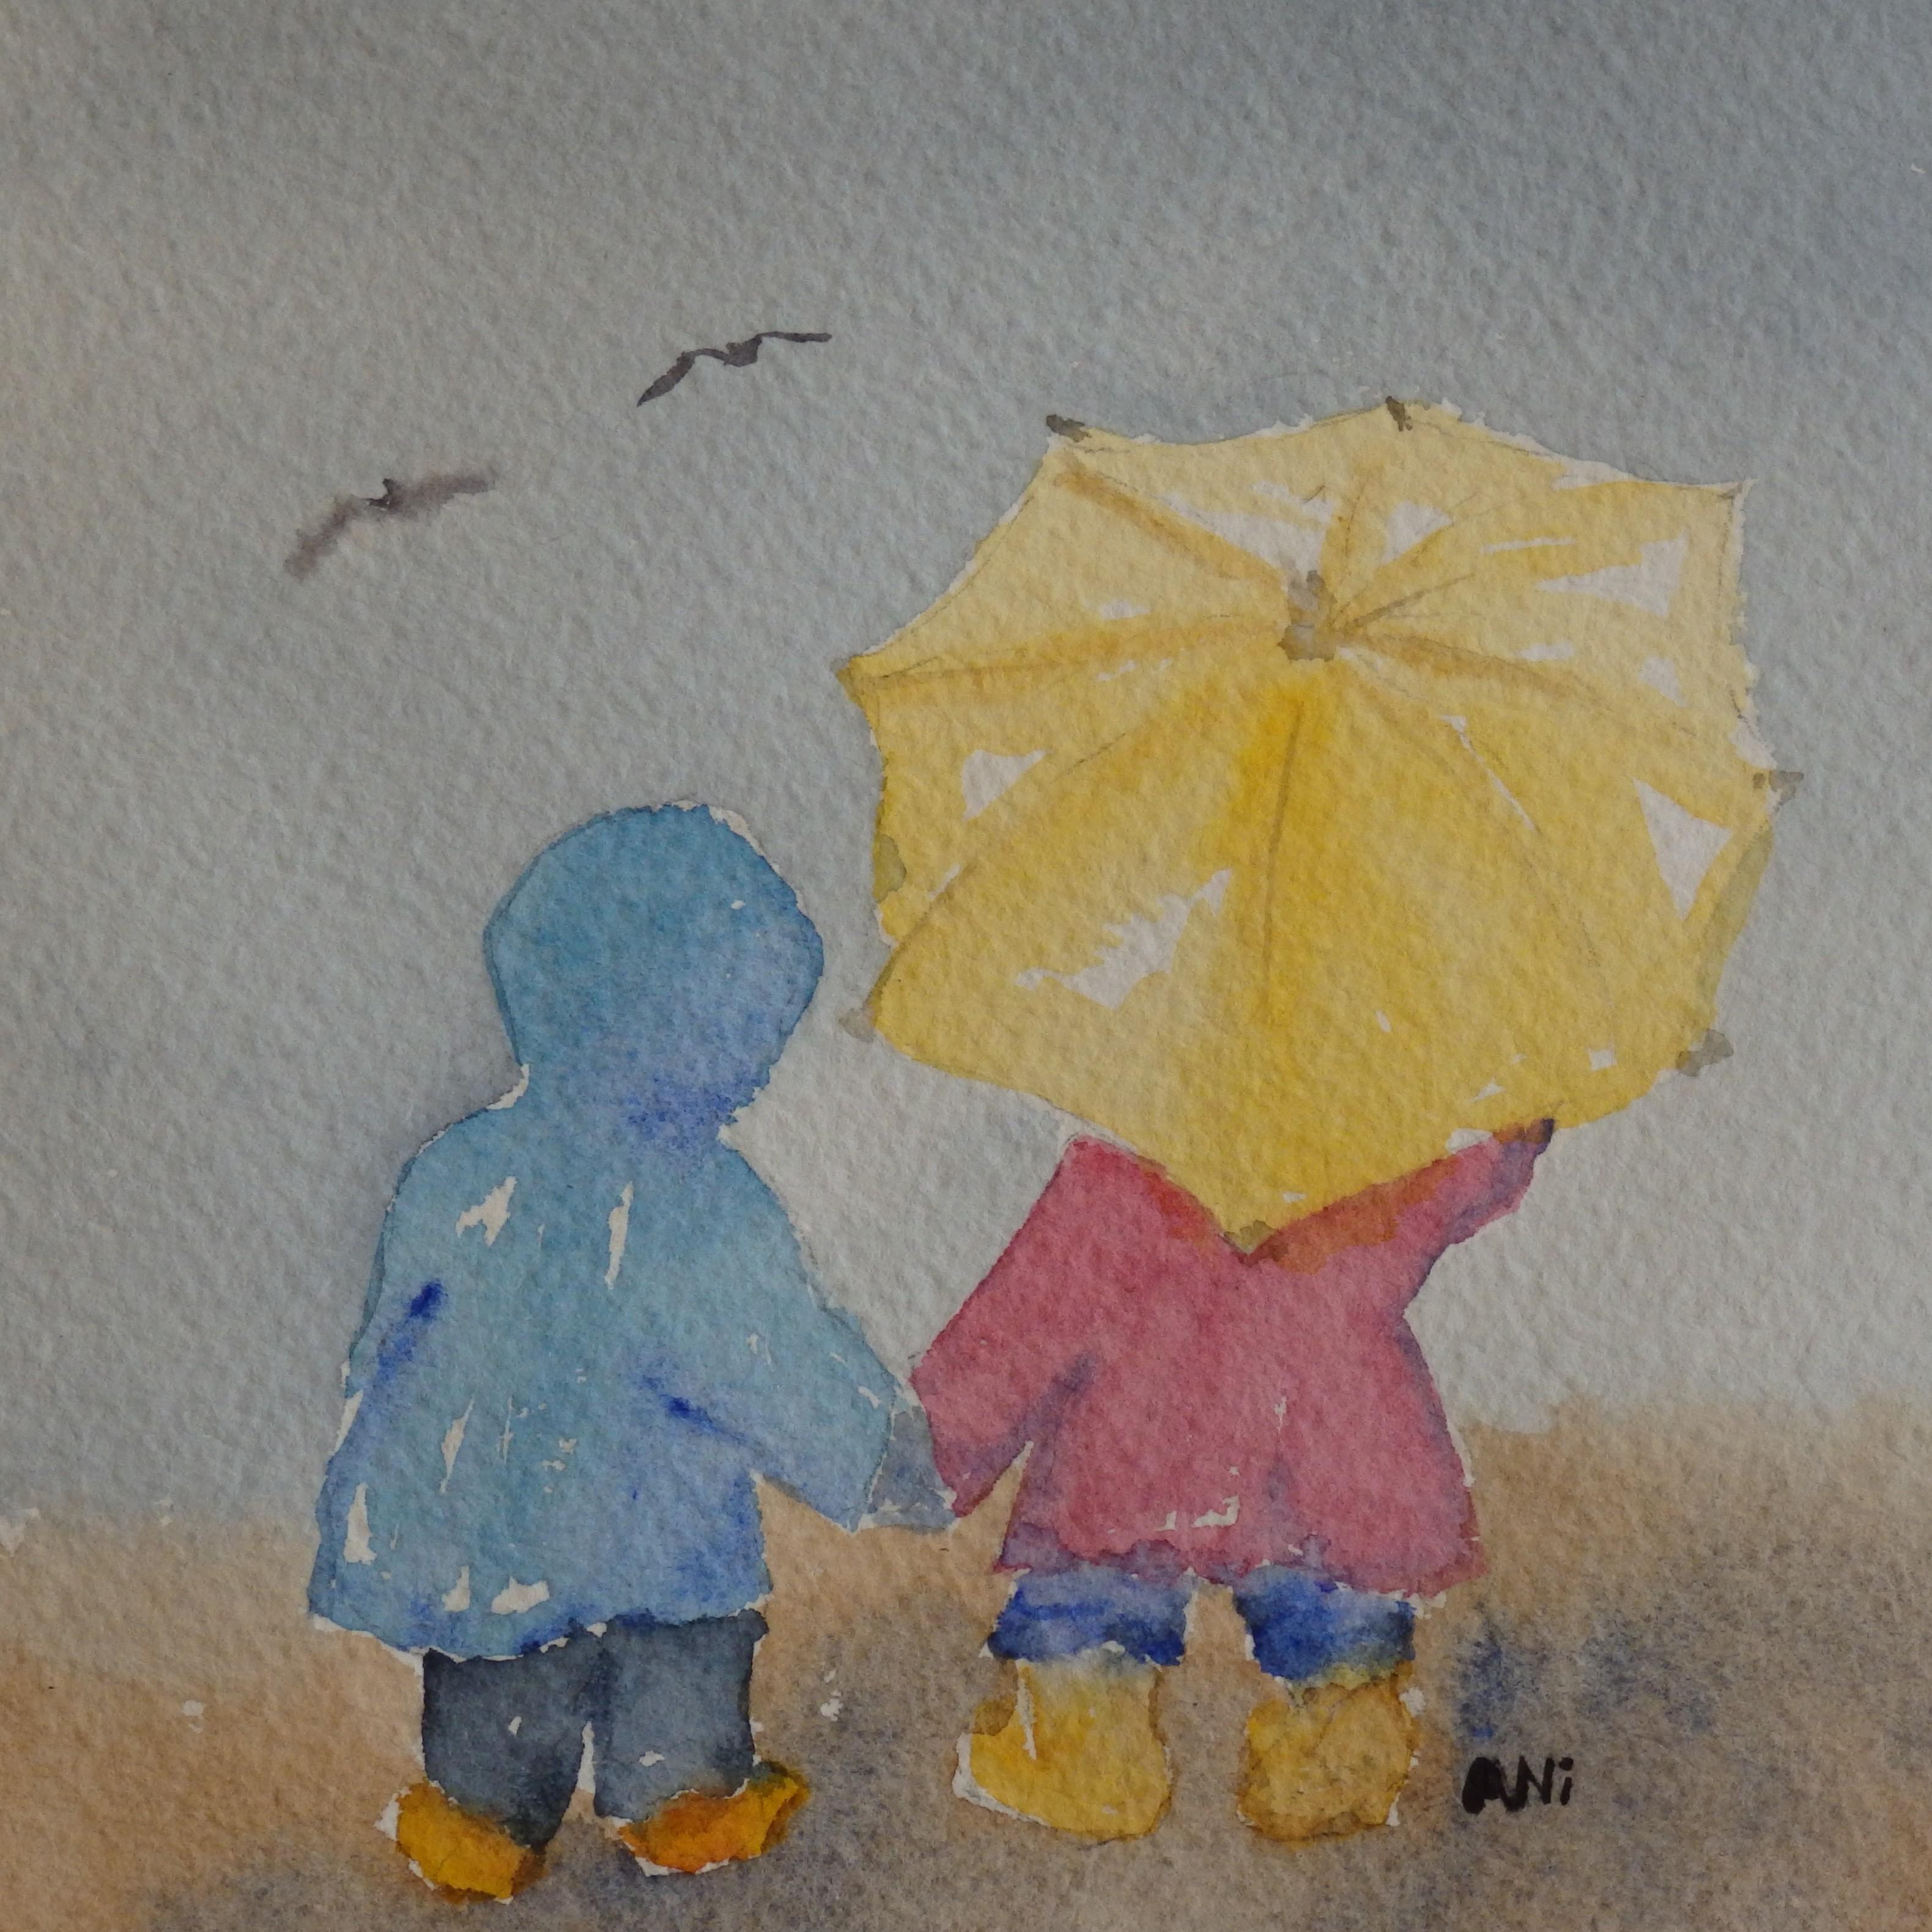 """Vänner m paraply"" 18x18cm"